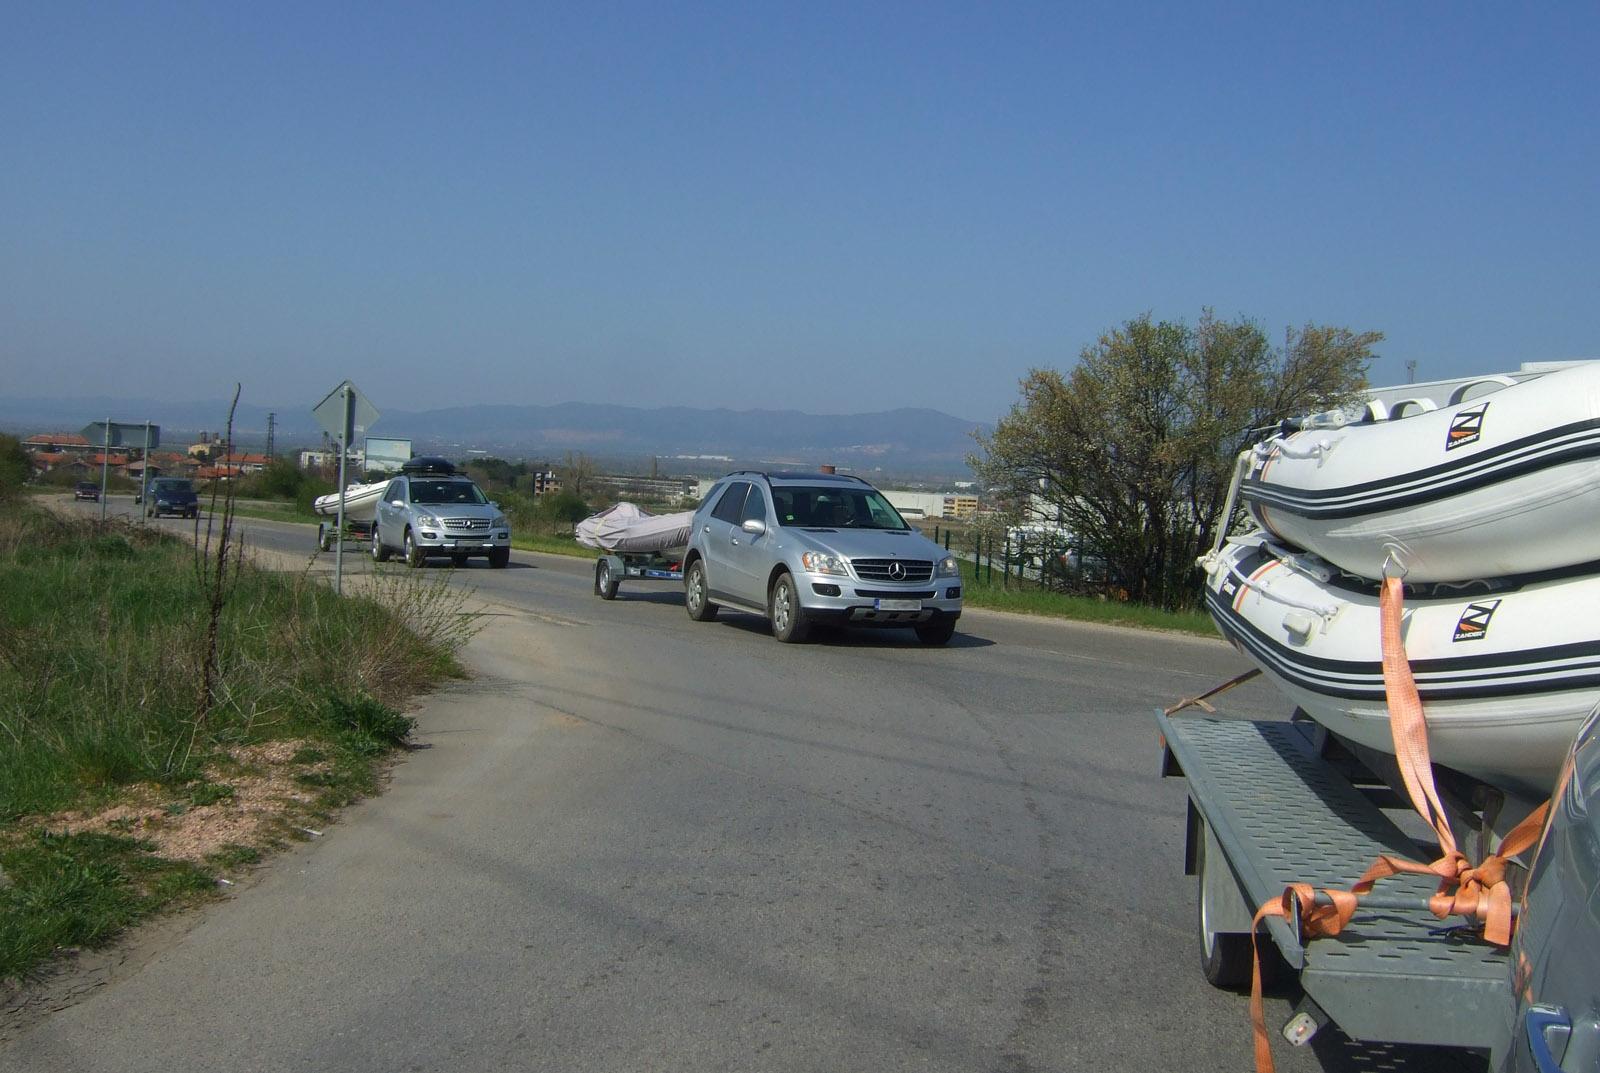 ZANDER надуваеми лодки, алуминиеви лодки и др. - Page 9 24uycmv